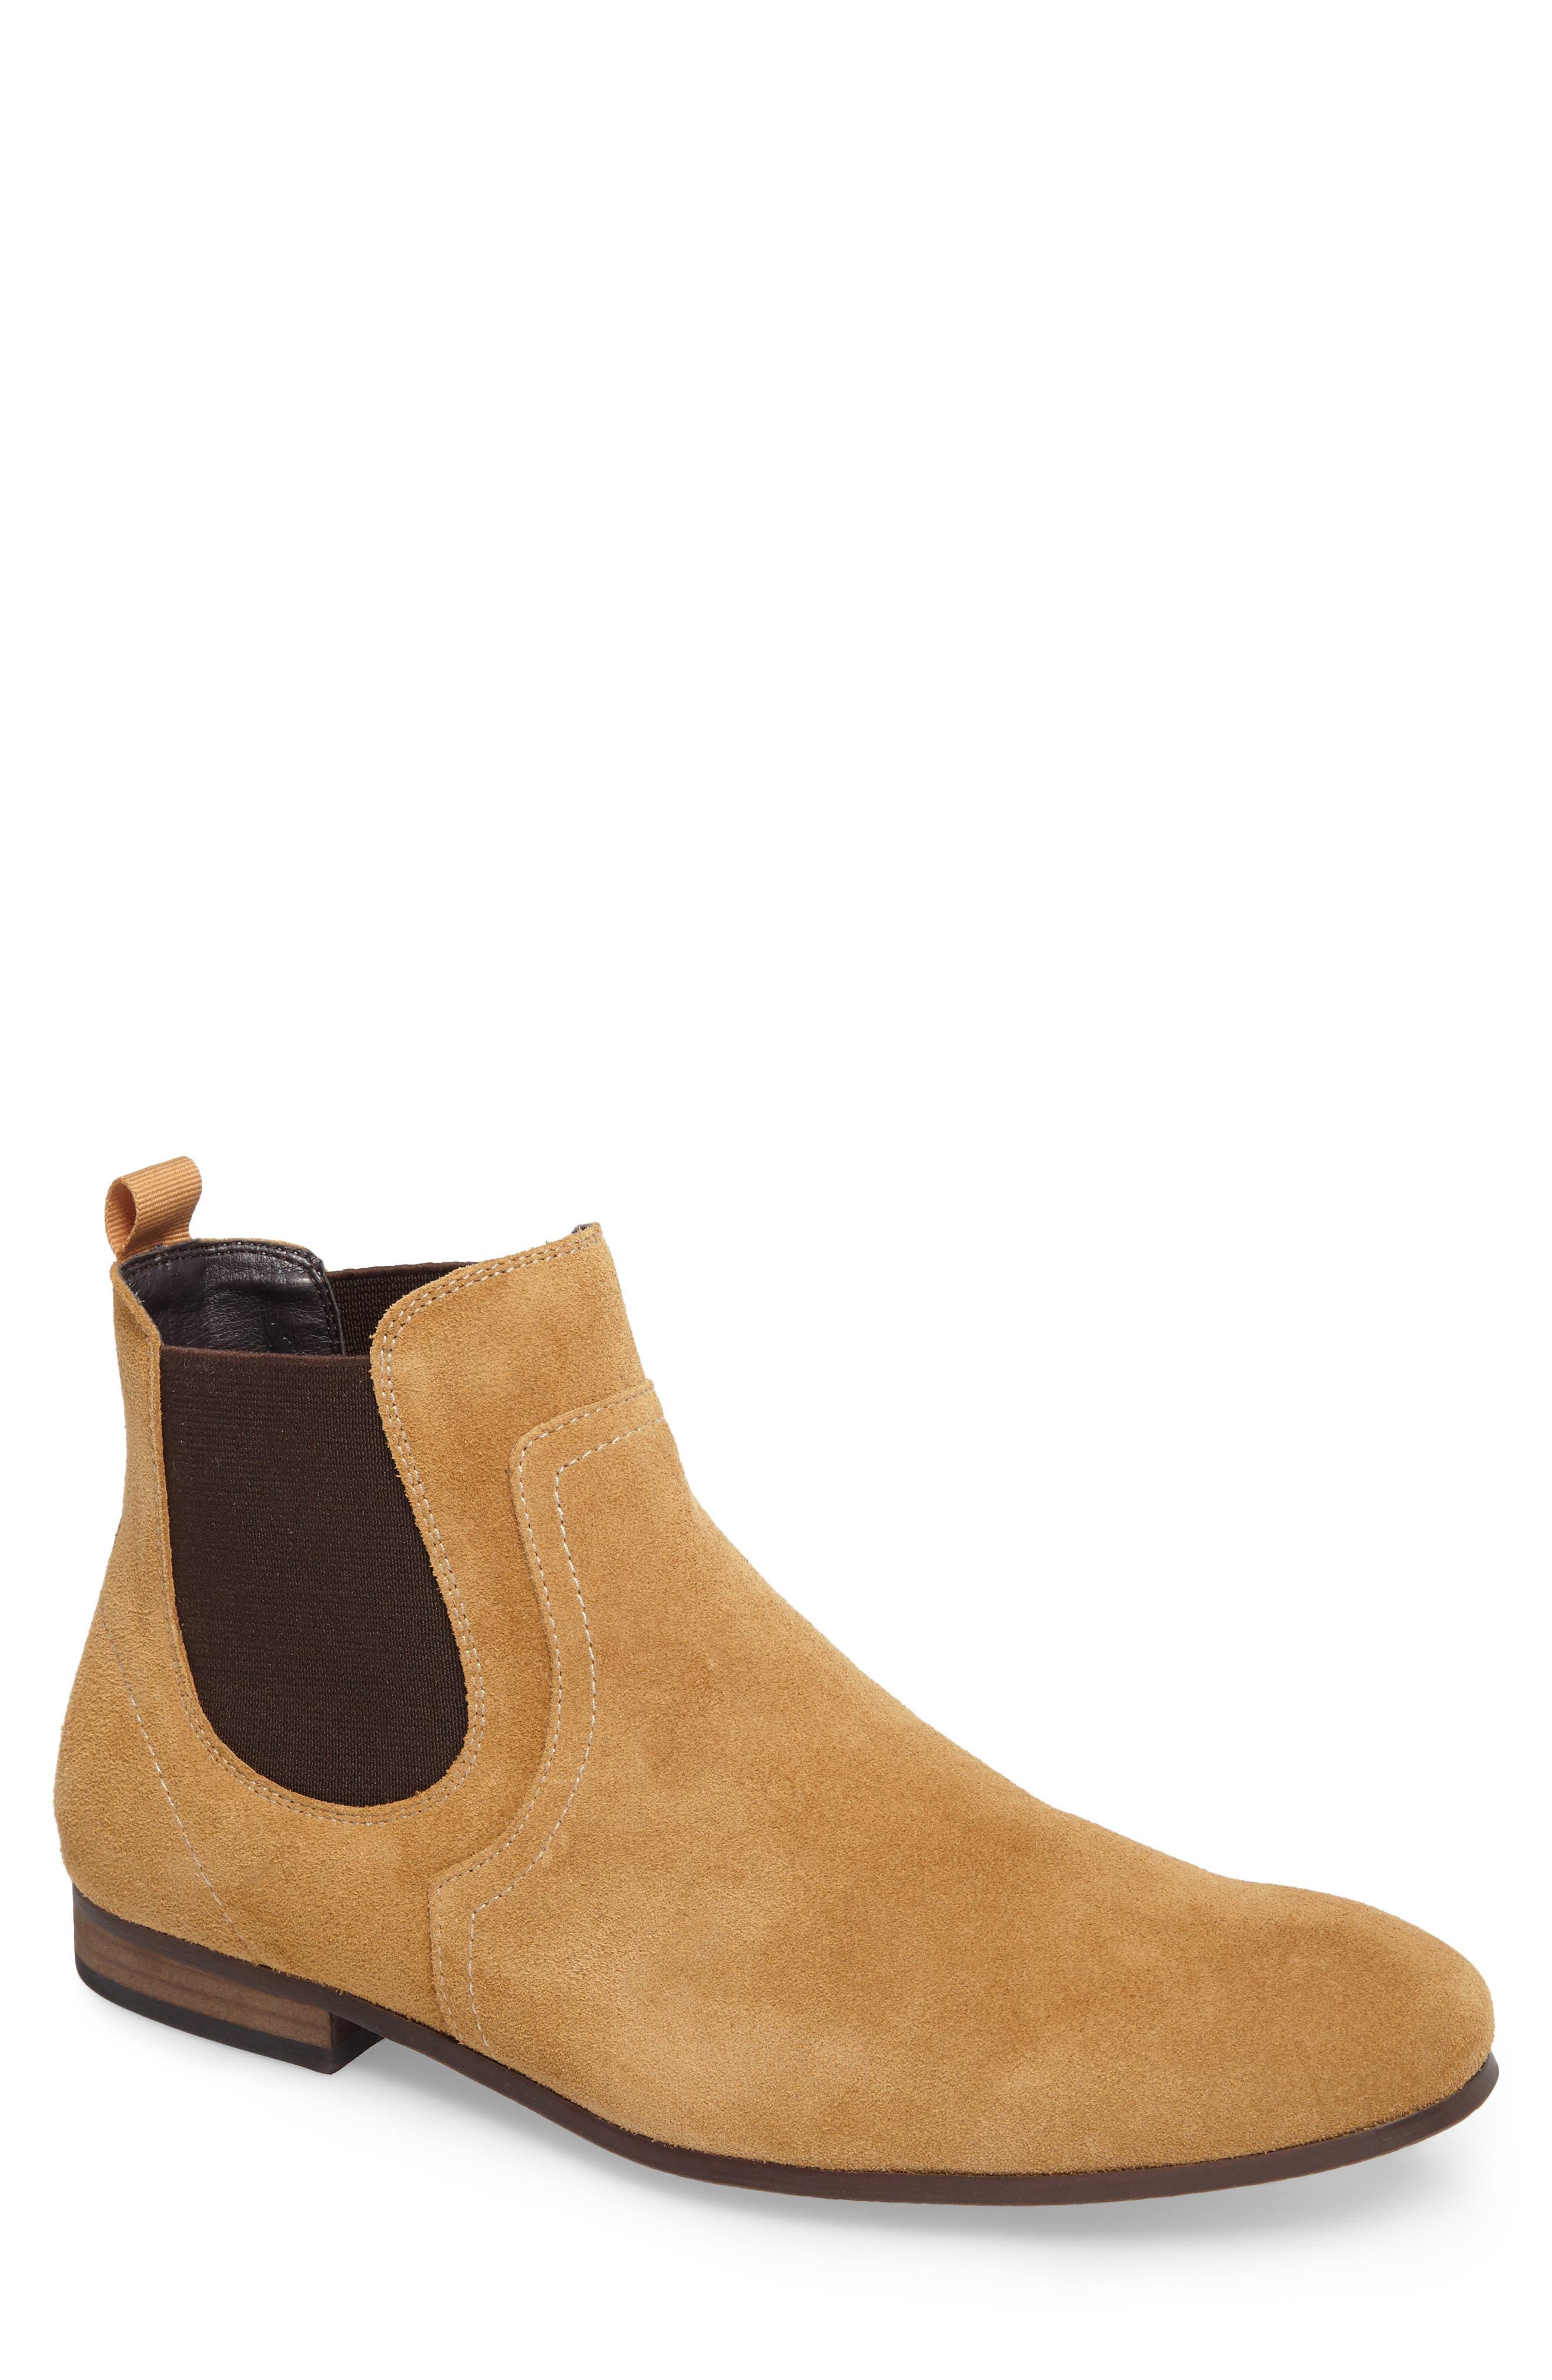 Alternate Image 1 Selected - The Rail Brysen Chelsea Boot (Men)